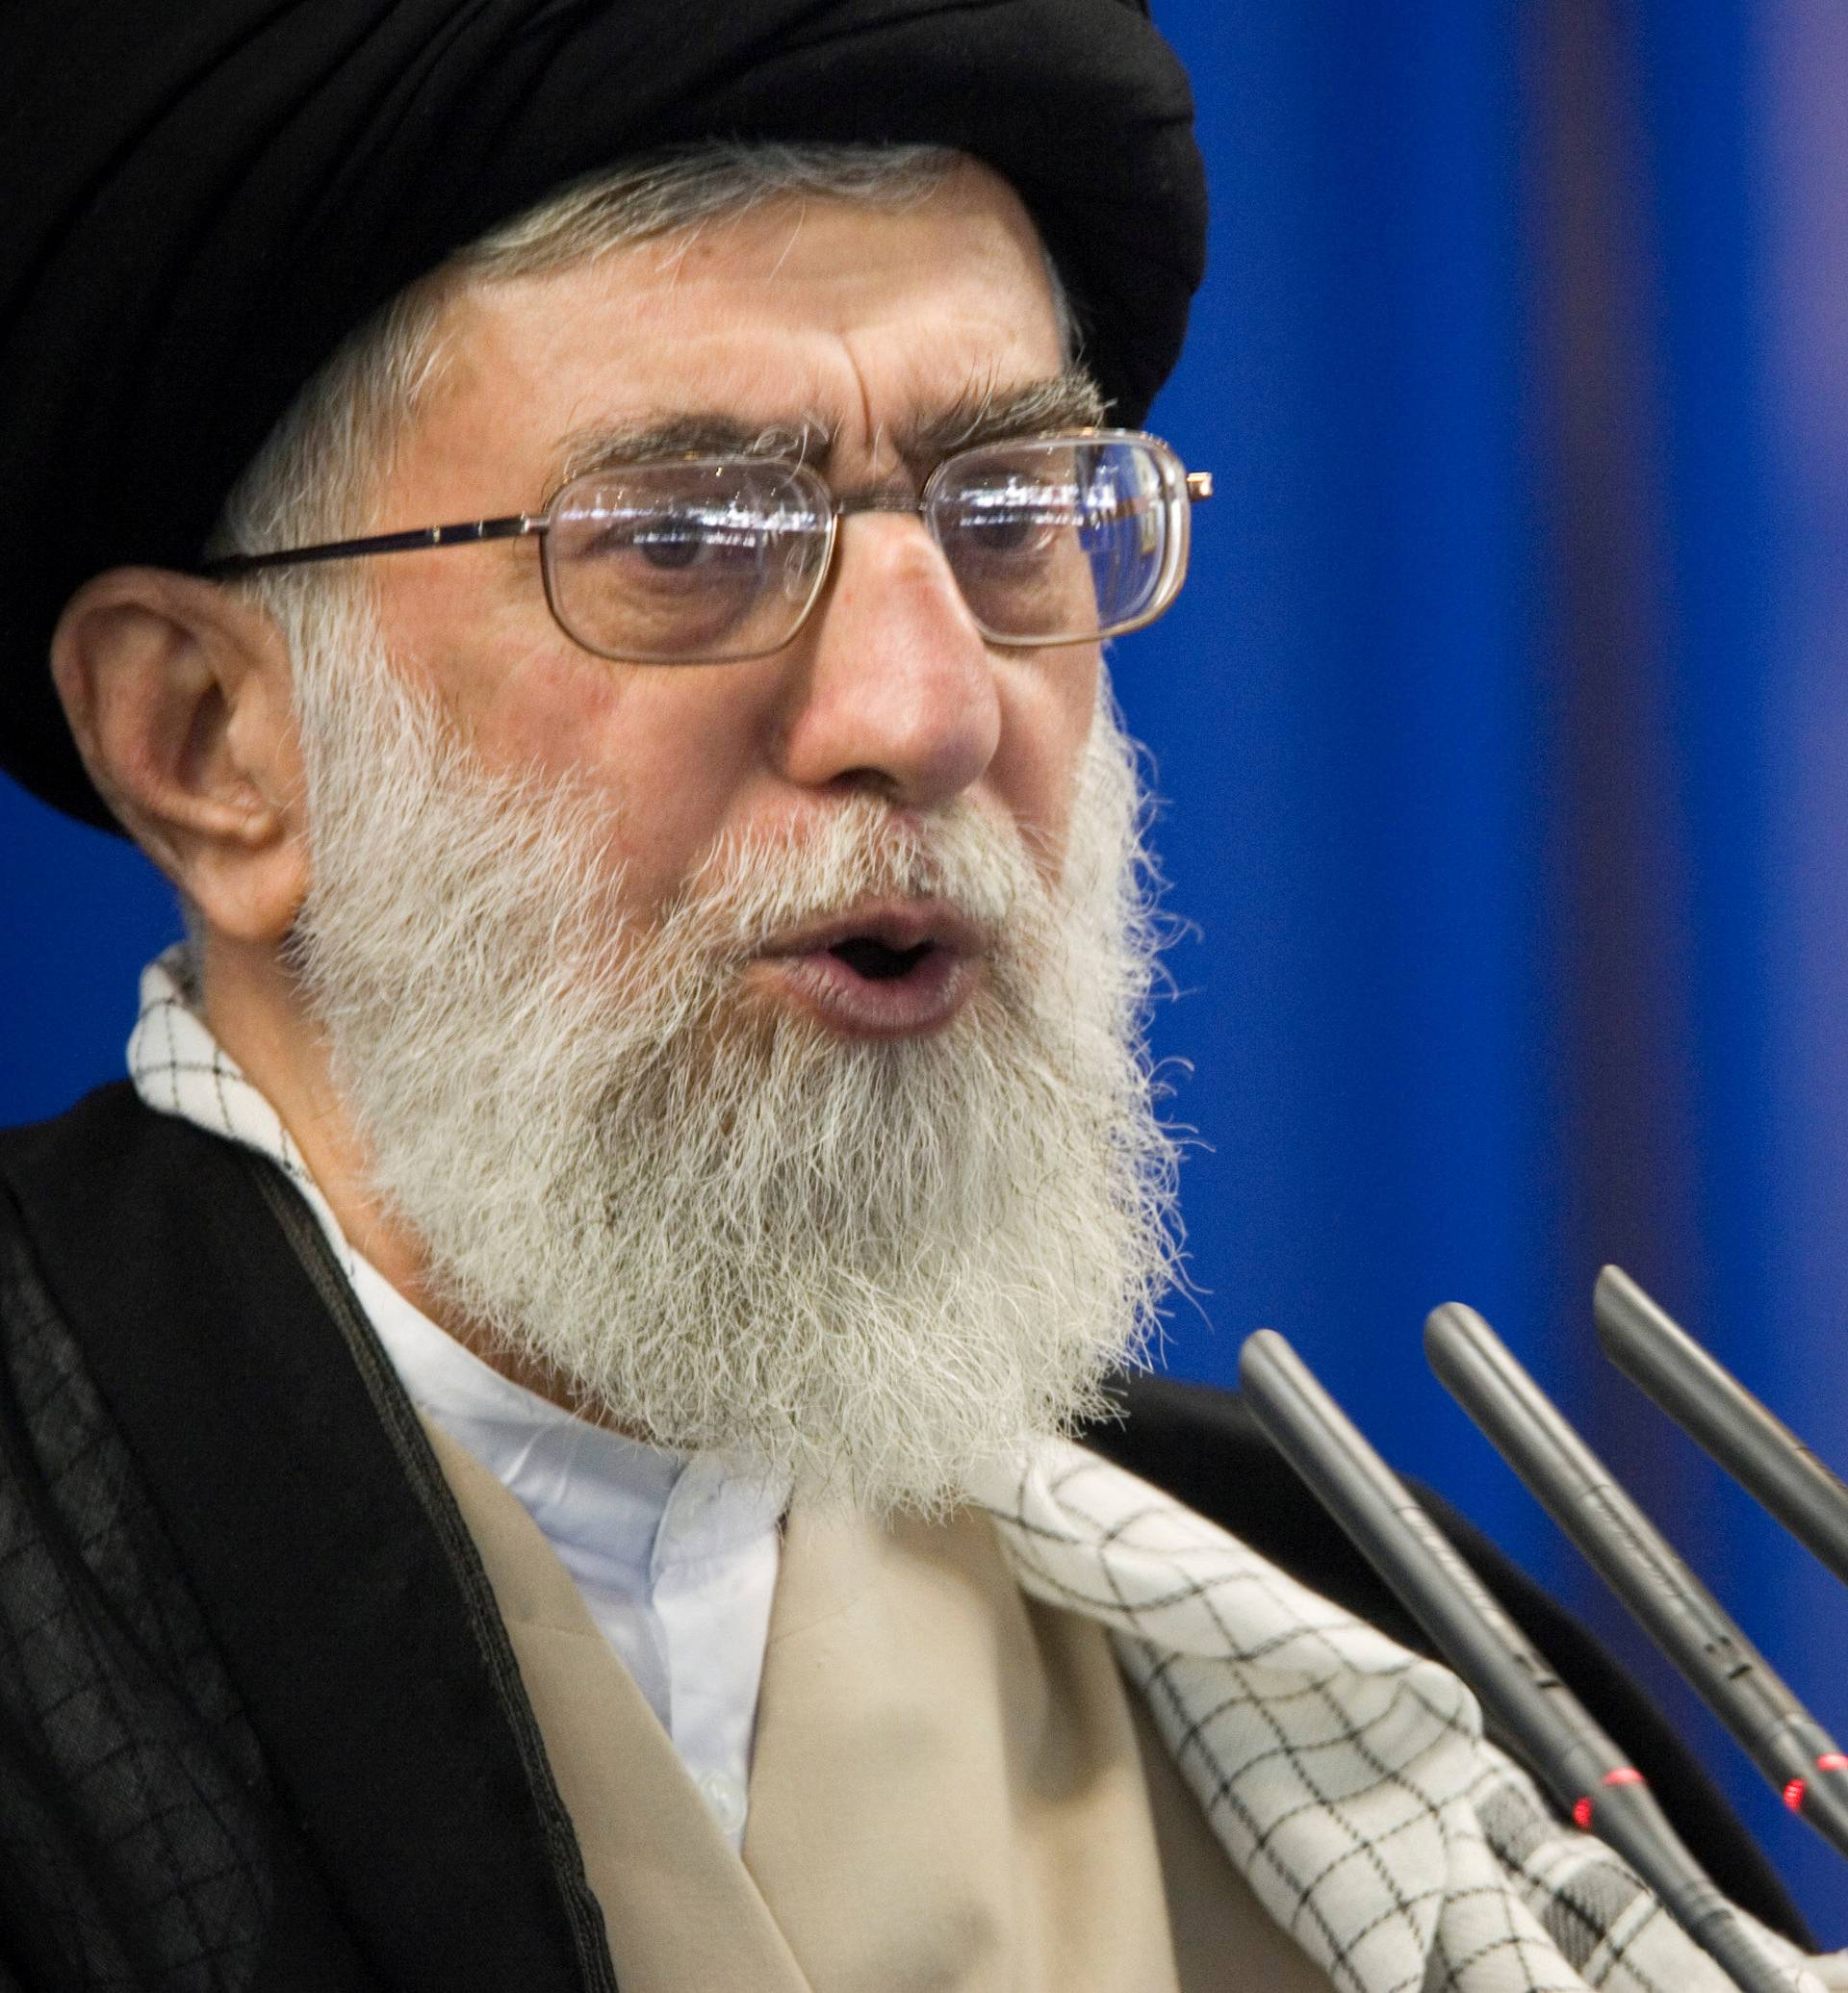 FILE PHOTO: FILE PHOTO: Iran's Supreme Leader Ayatollah Ali Khamenei speaks during Friday prayers in Tehran